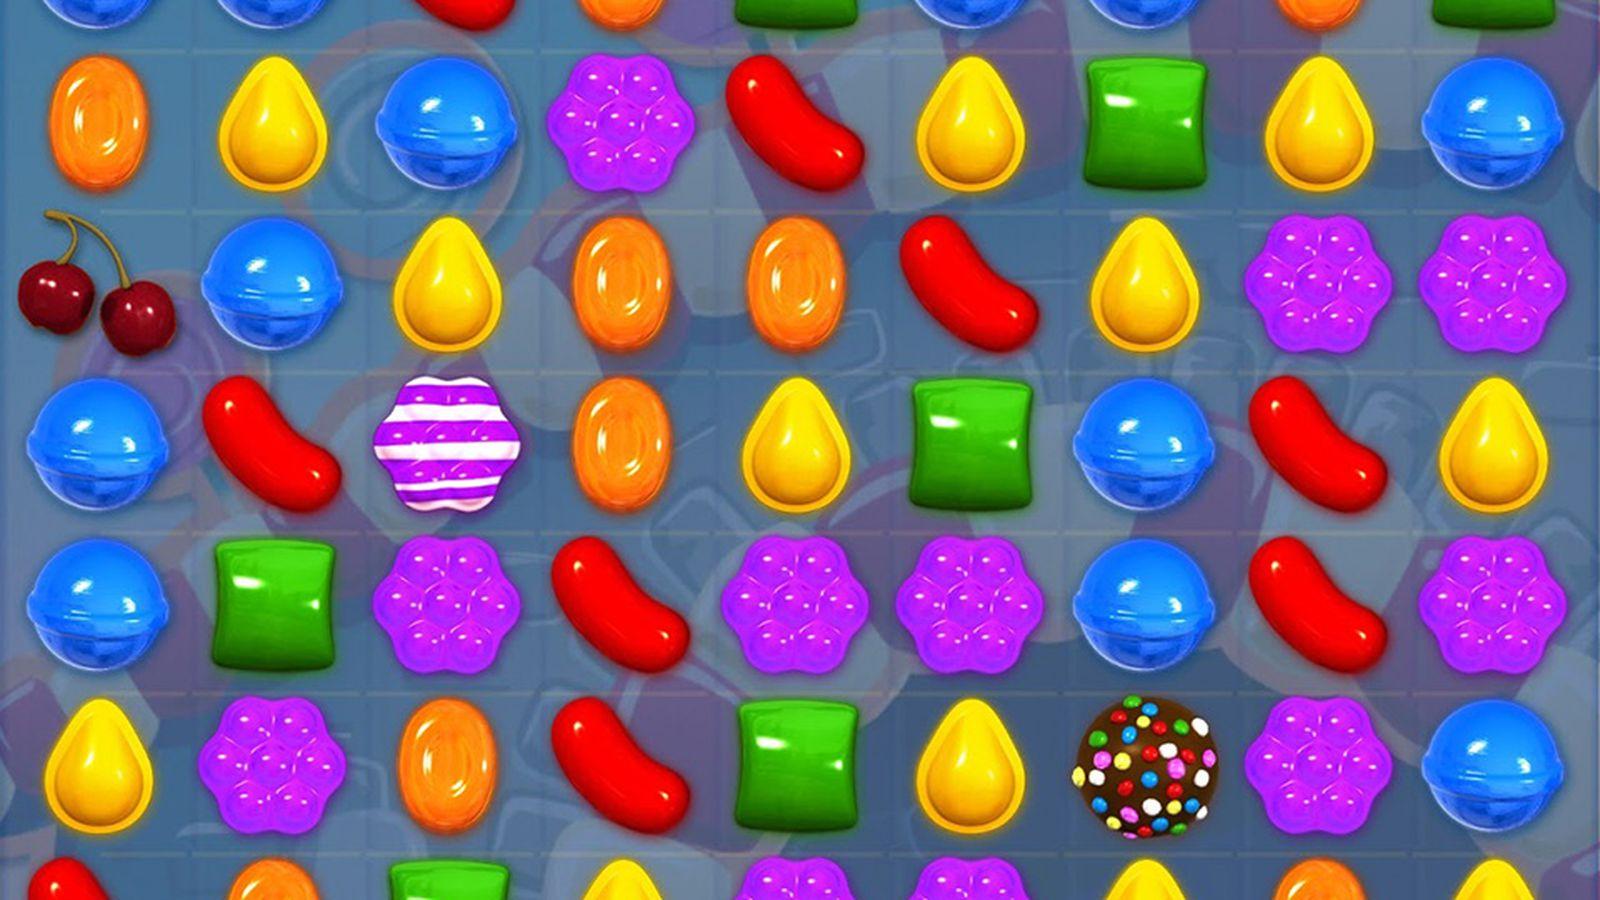 Spielstand Candy Crush Гјbertragen